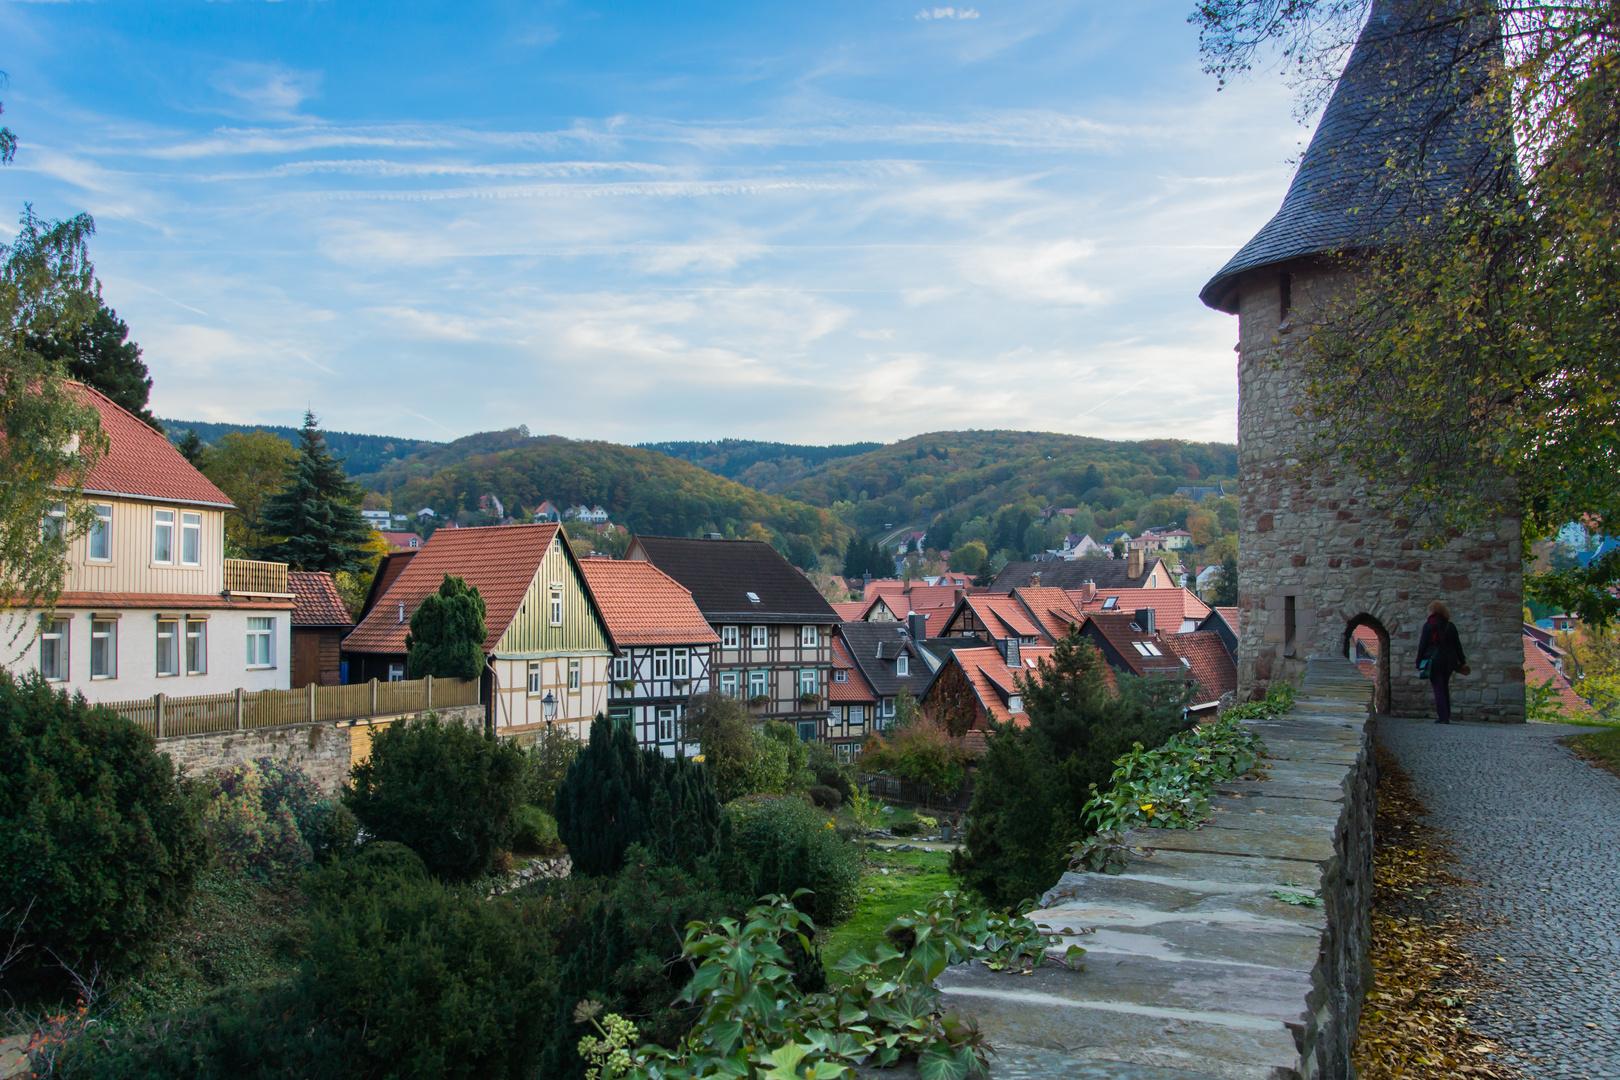 Stadtmauer I - Wernigerode/Harz